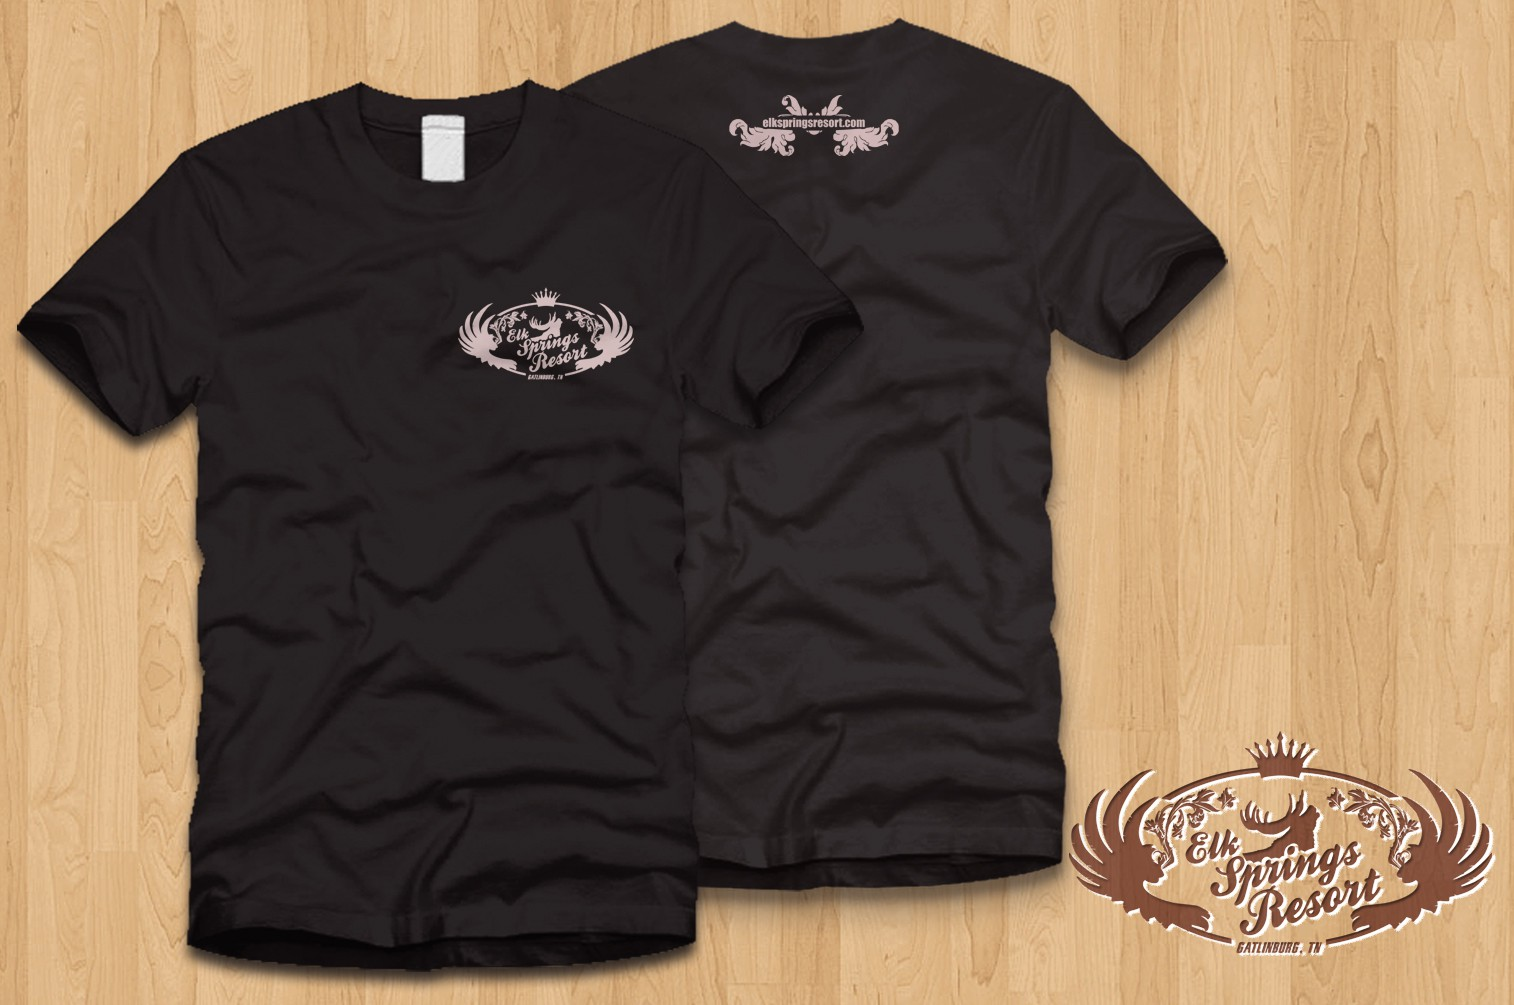 Create an edgy t-shirt design for Elk Springs Resort